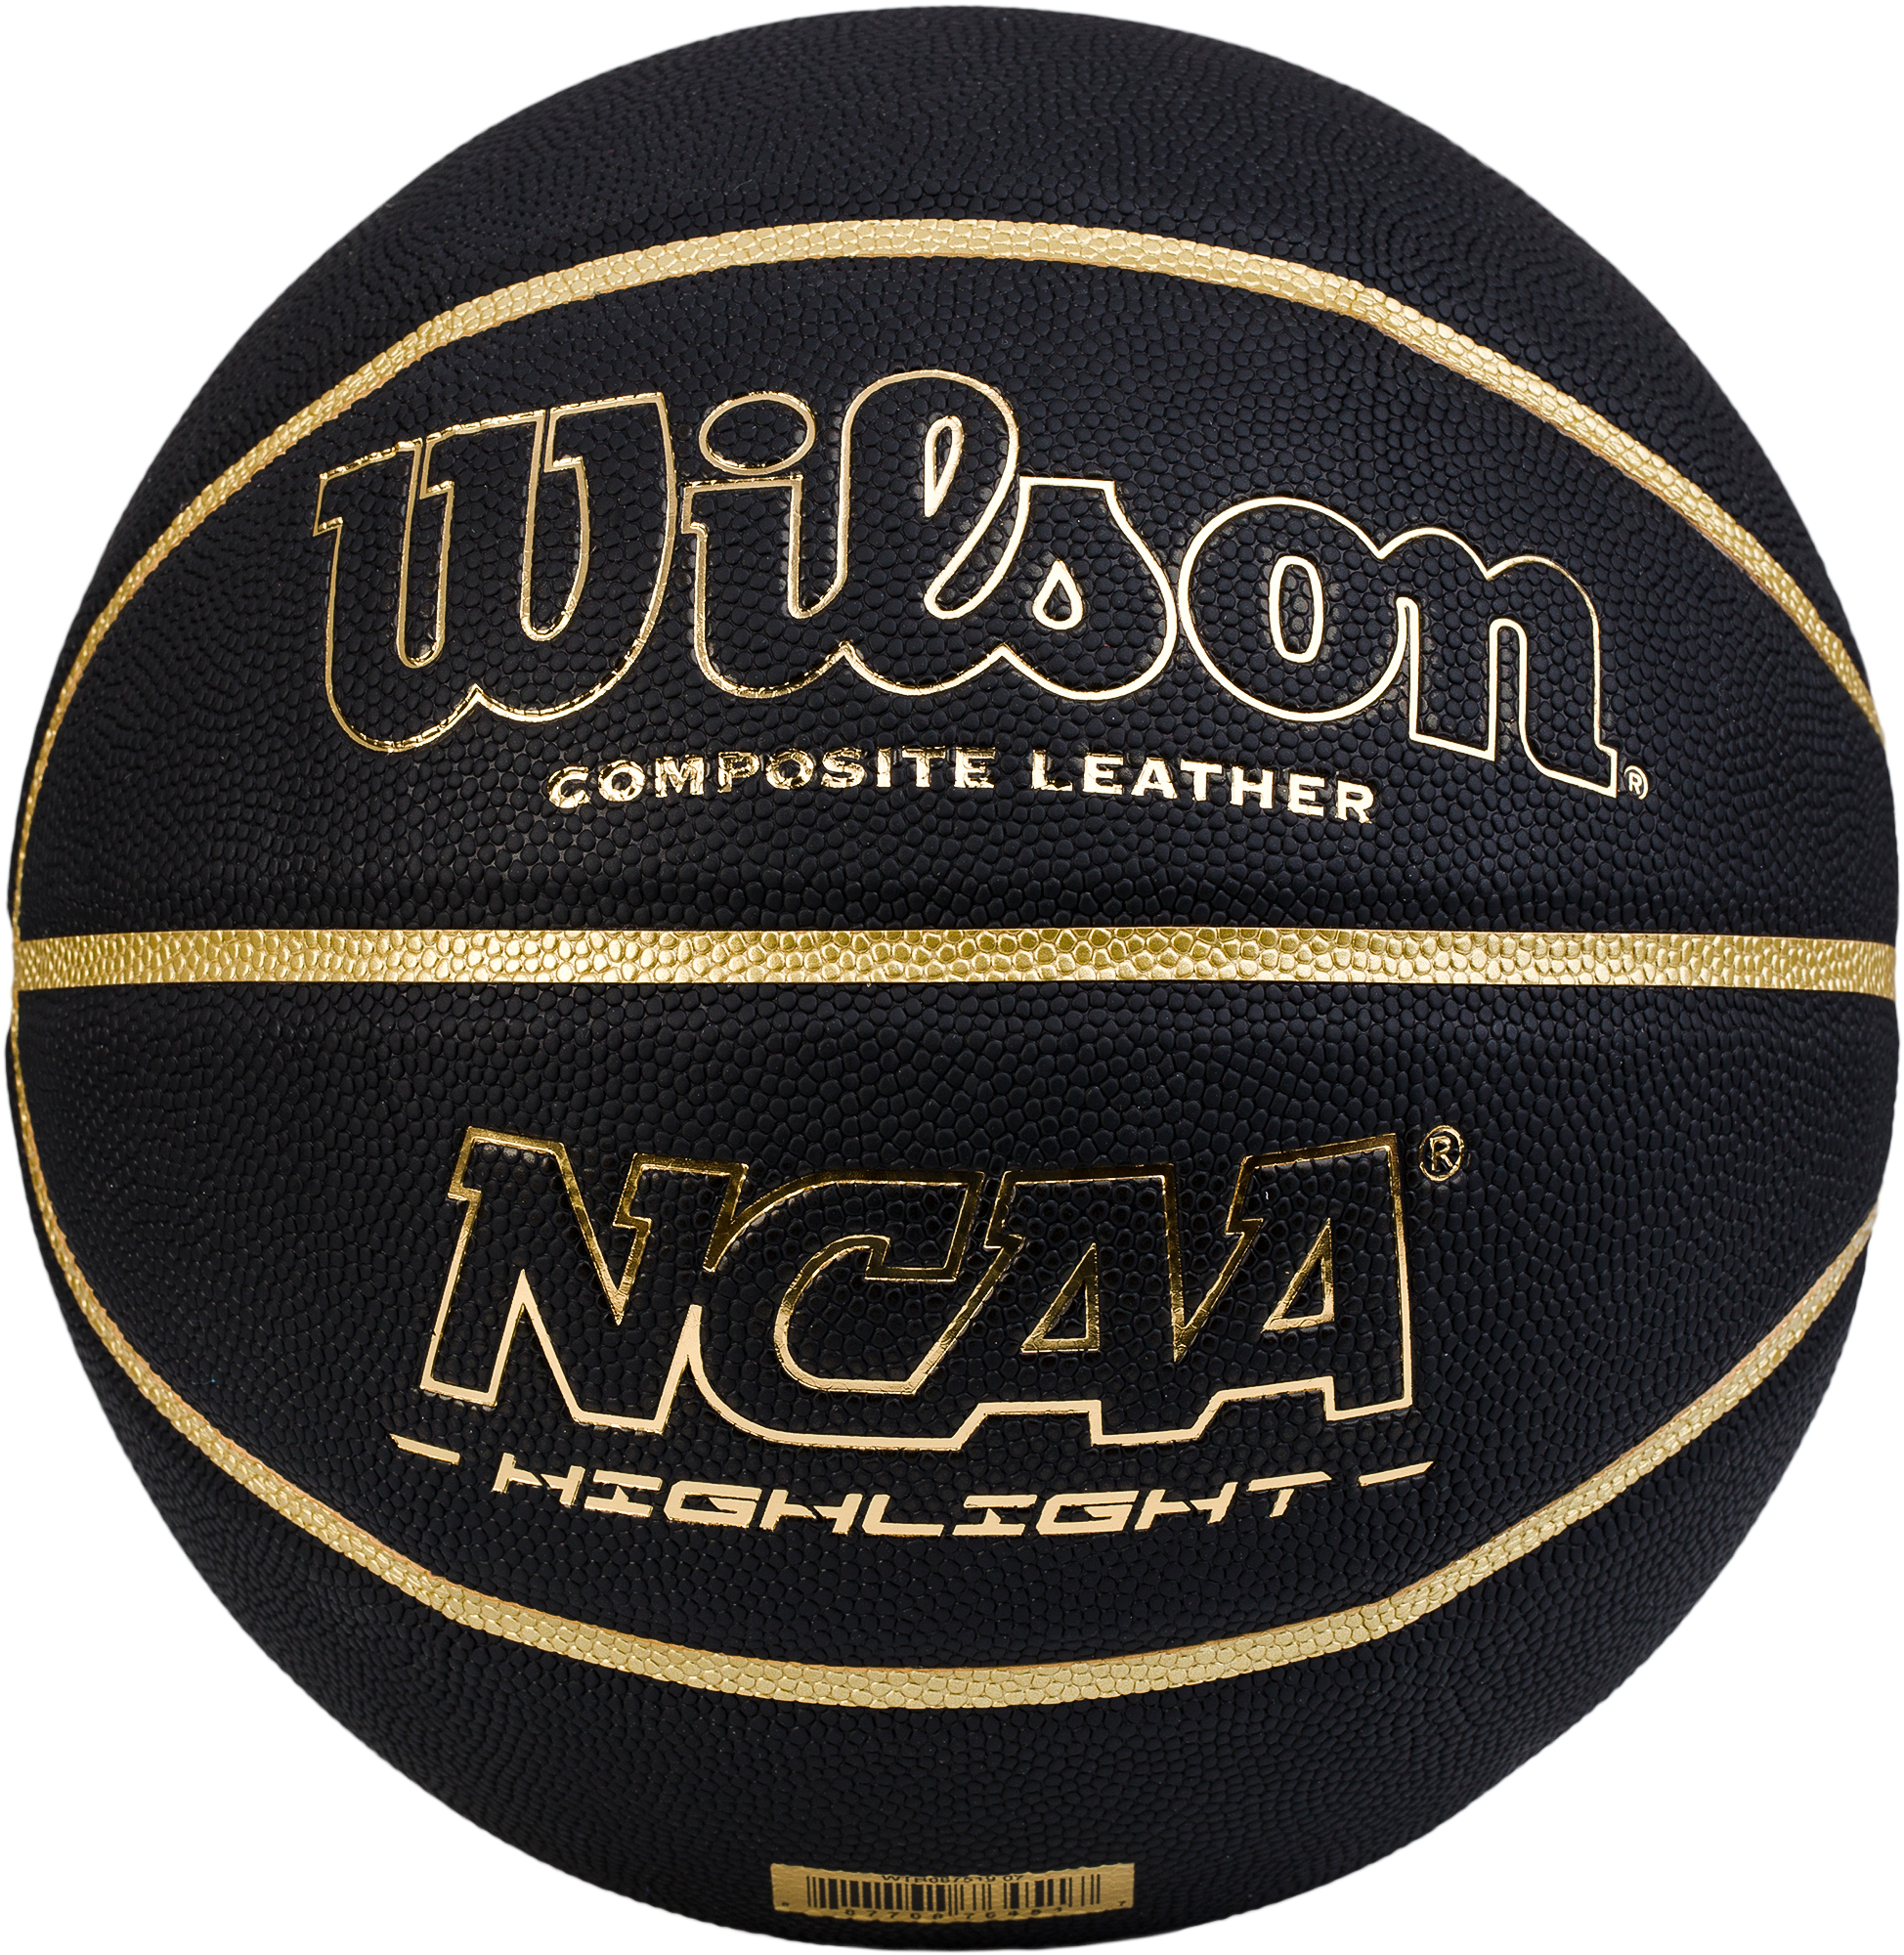 Wilson Мяч баскетбольный WilsonNCAA HIGHLIGHT GOLD все цены